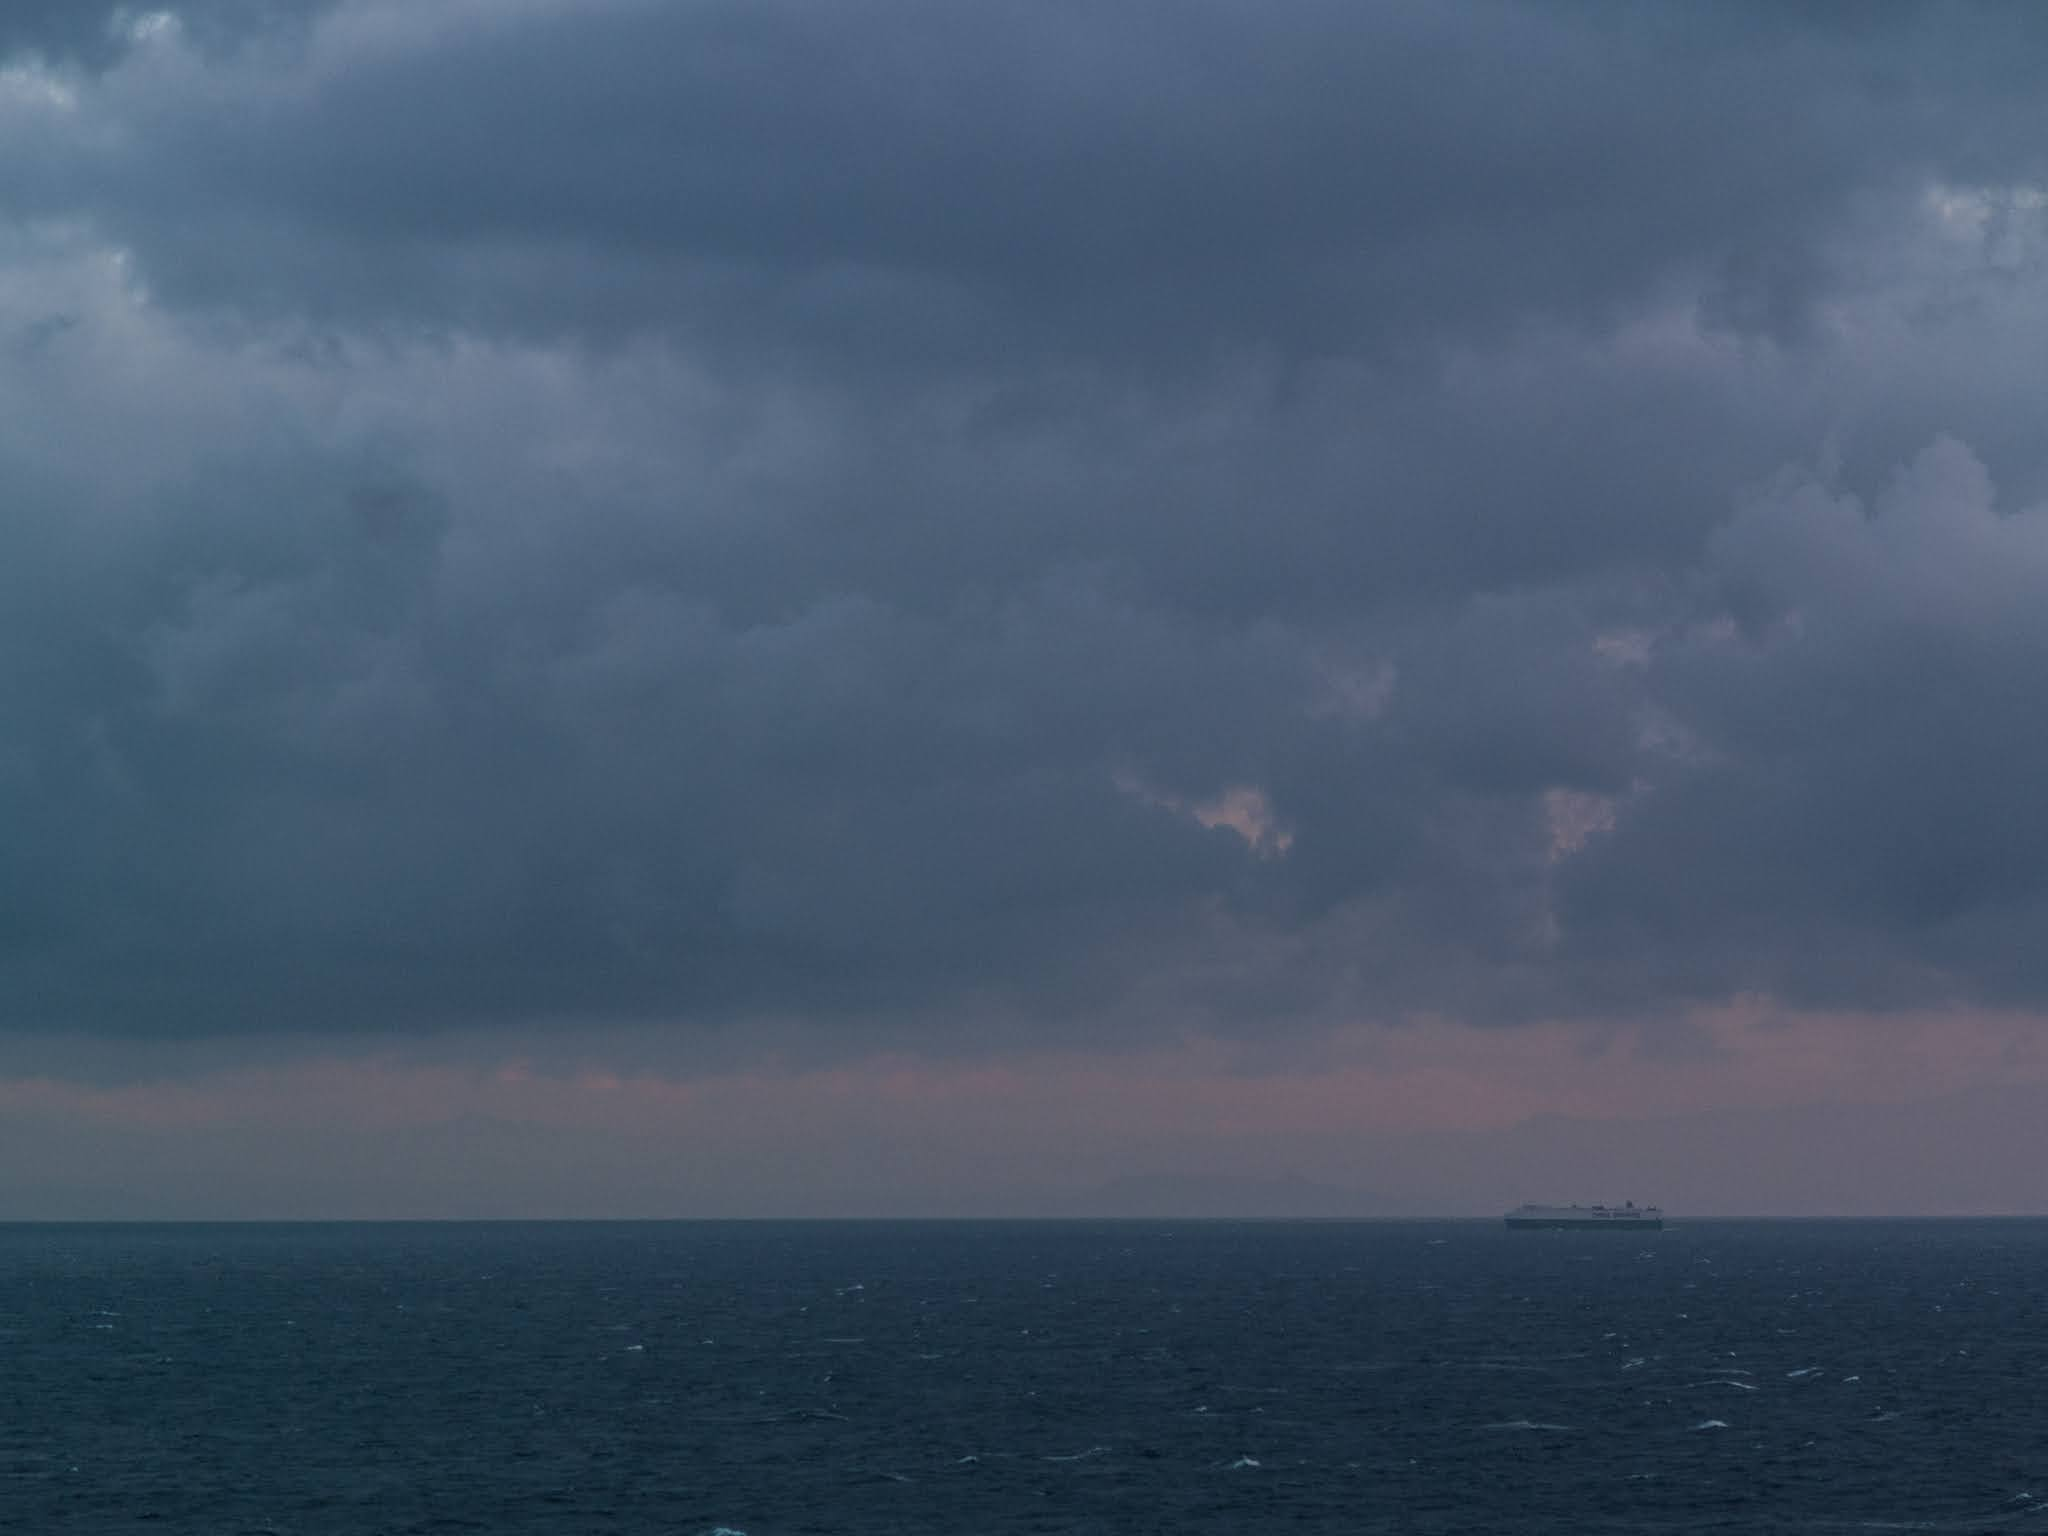 Ship on the horizon at sunset on the Mediterranean Sea.